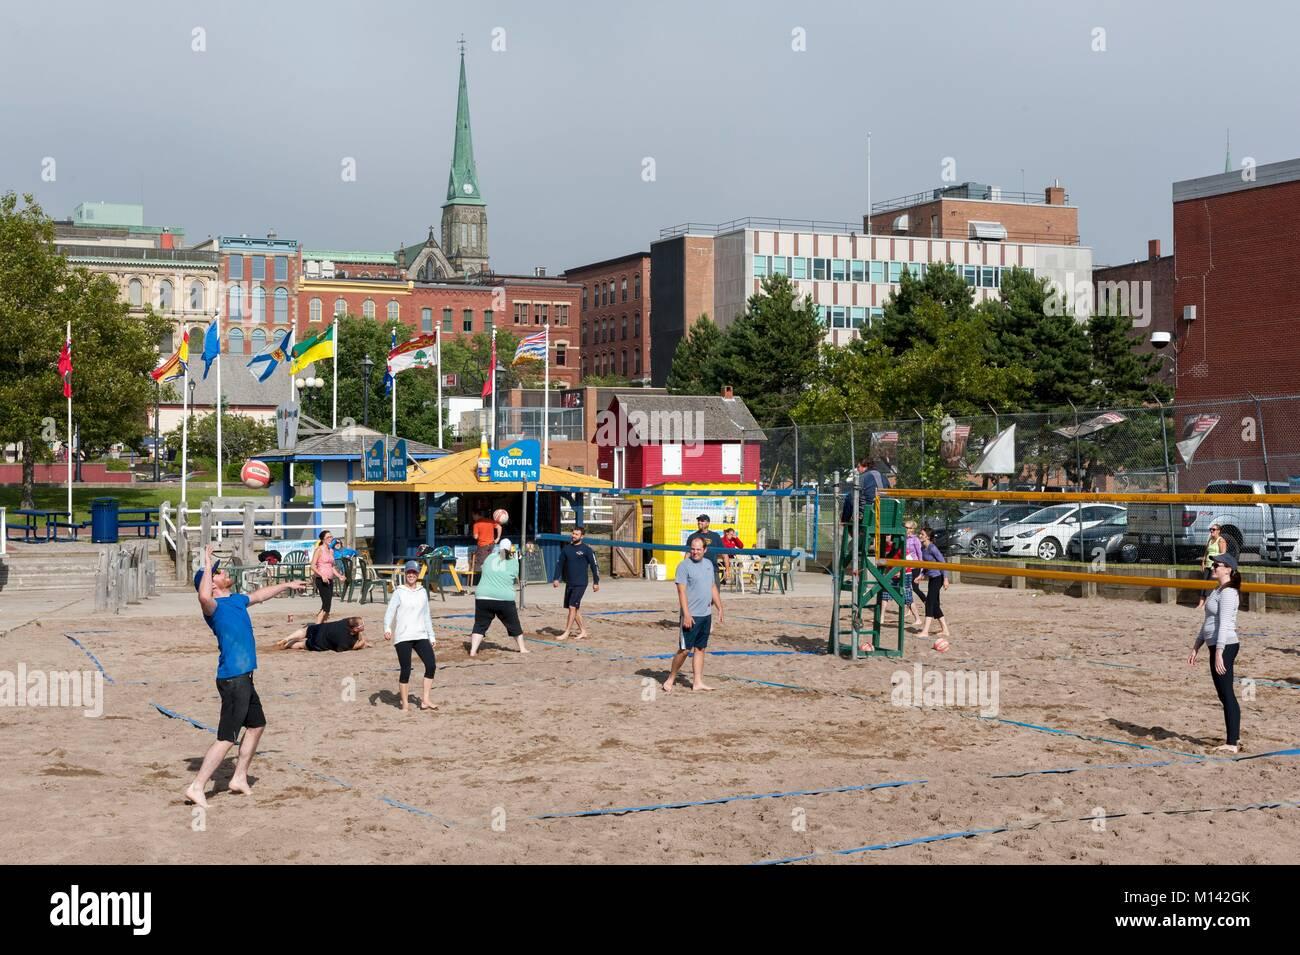 Canada, New Brunswick, Saint John, Market Square, Beach Volleyball Party - Stock Image